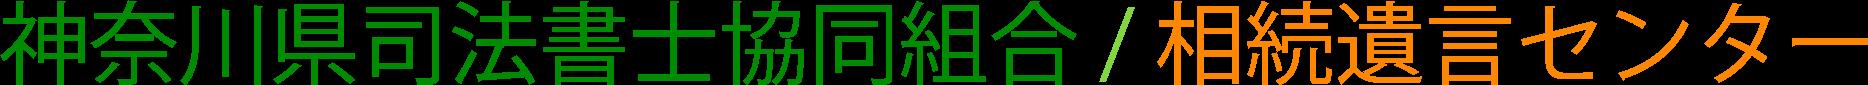 神奈川県司法書士協同組合|相続・遺言センター